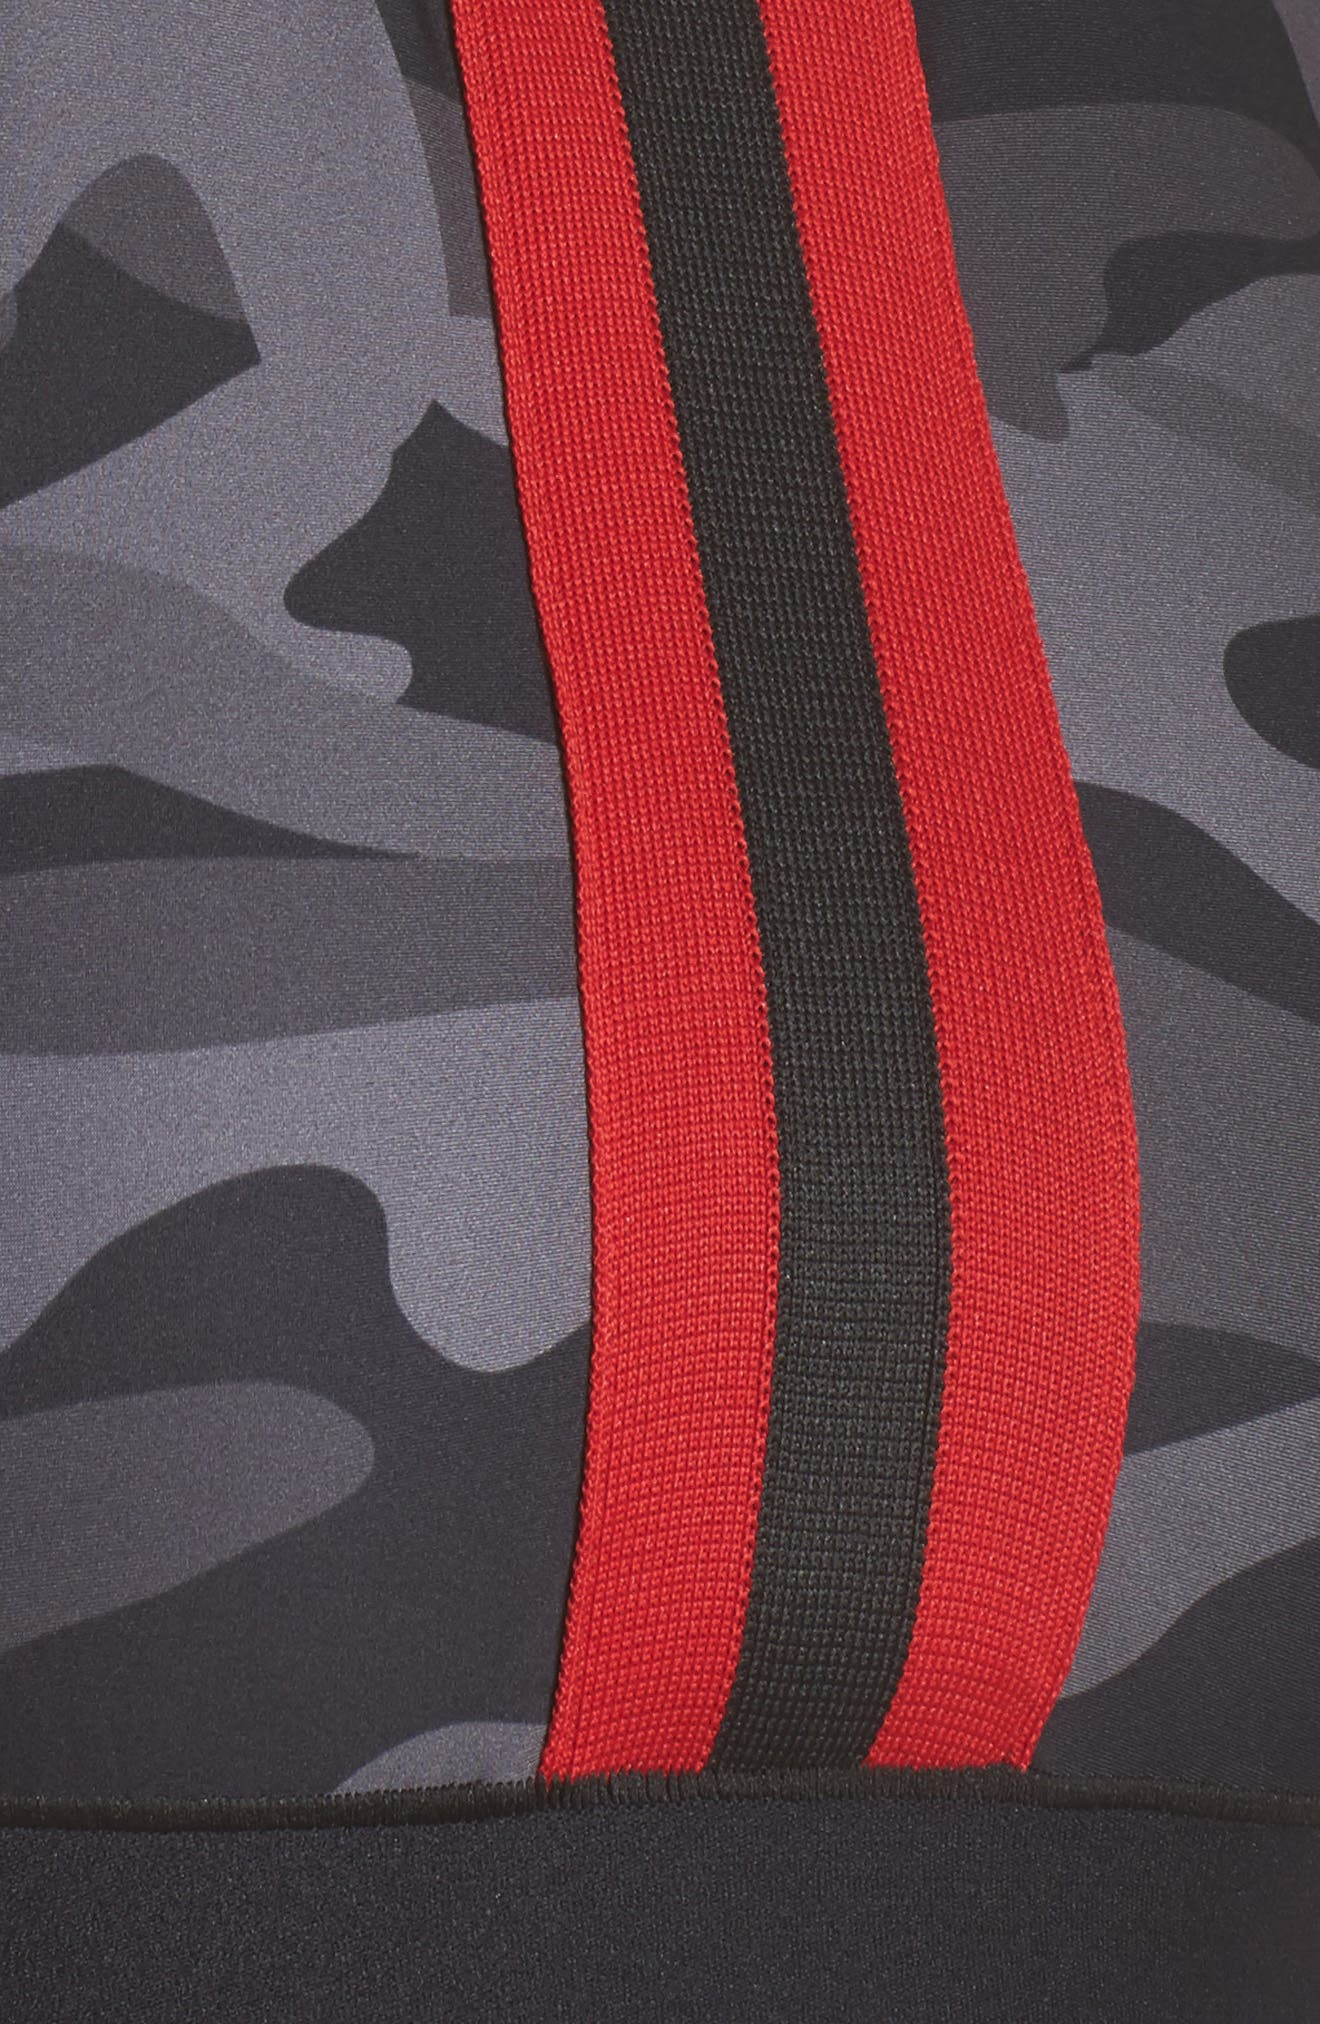 Level Camo Collegiate Crop Top,                             Alternate thumbnail 5, color,                             Nero Rouge